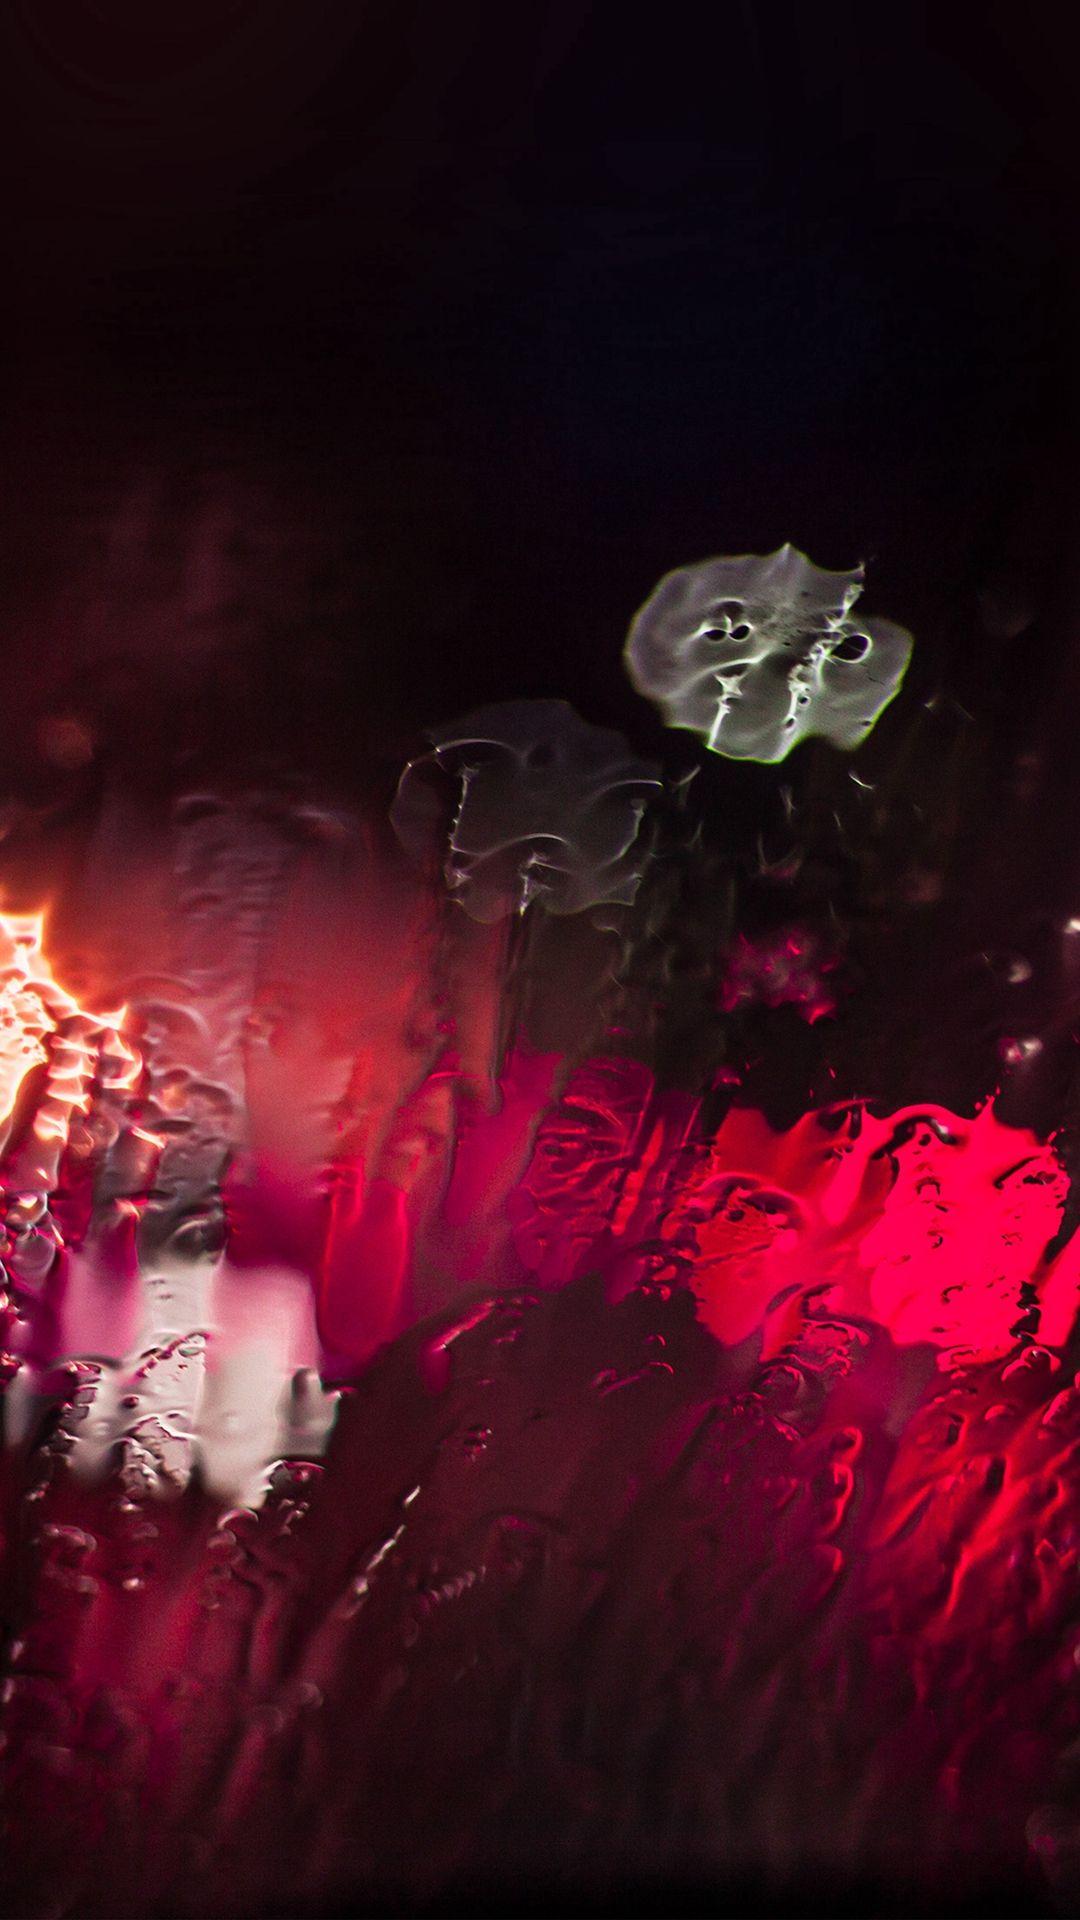 raining window bokeh red light iphone 6 wallpaper | watery